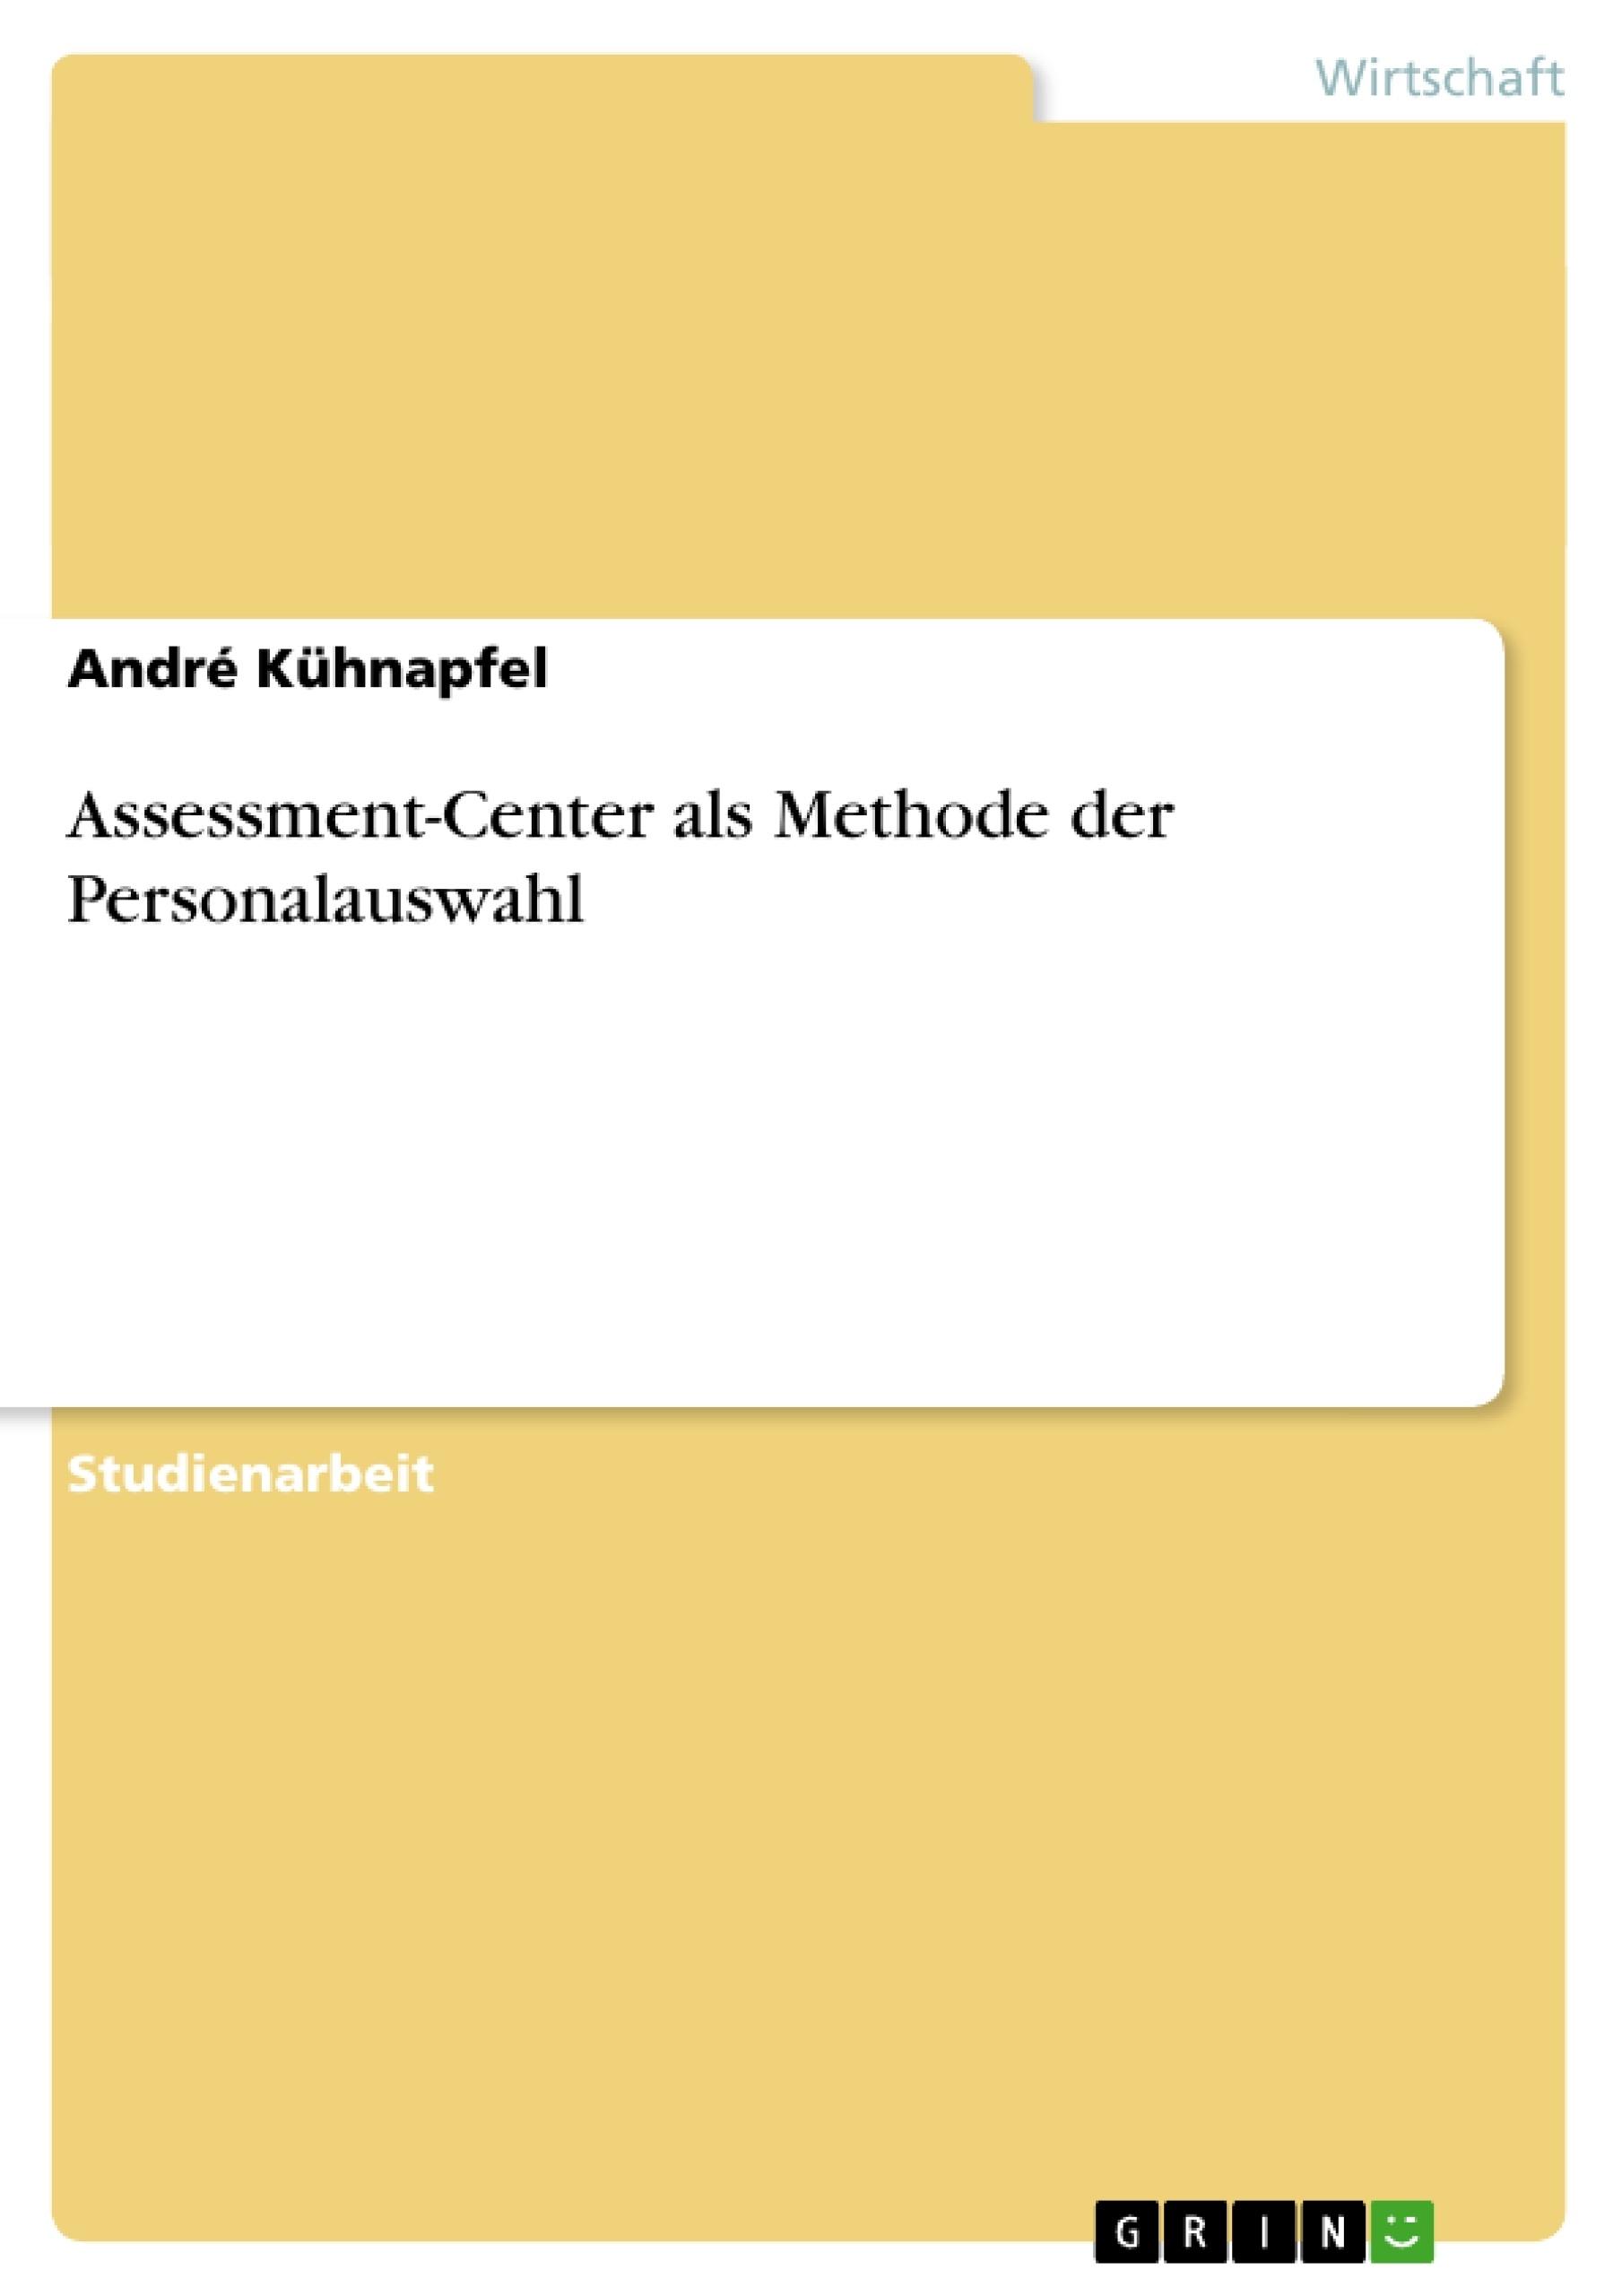 Titel: Assessment-Center als Methode der Personalauswahl